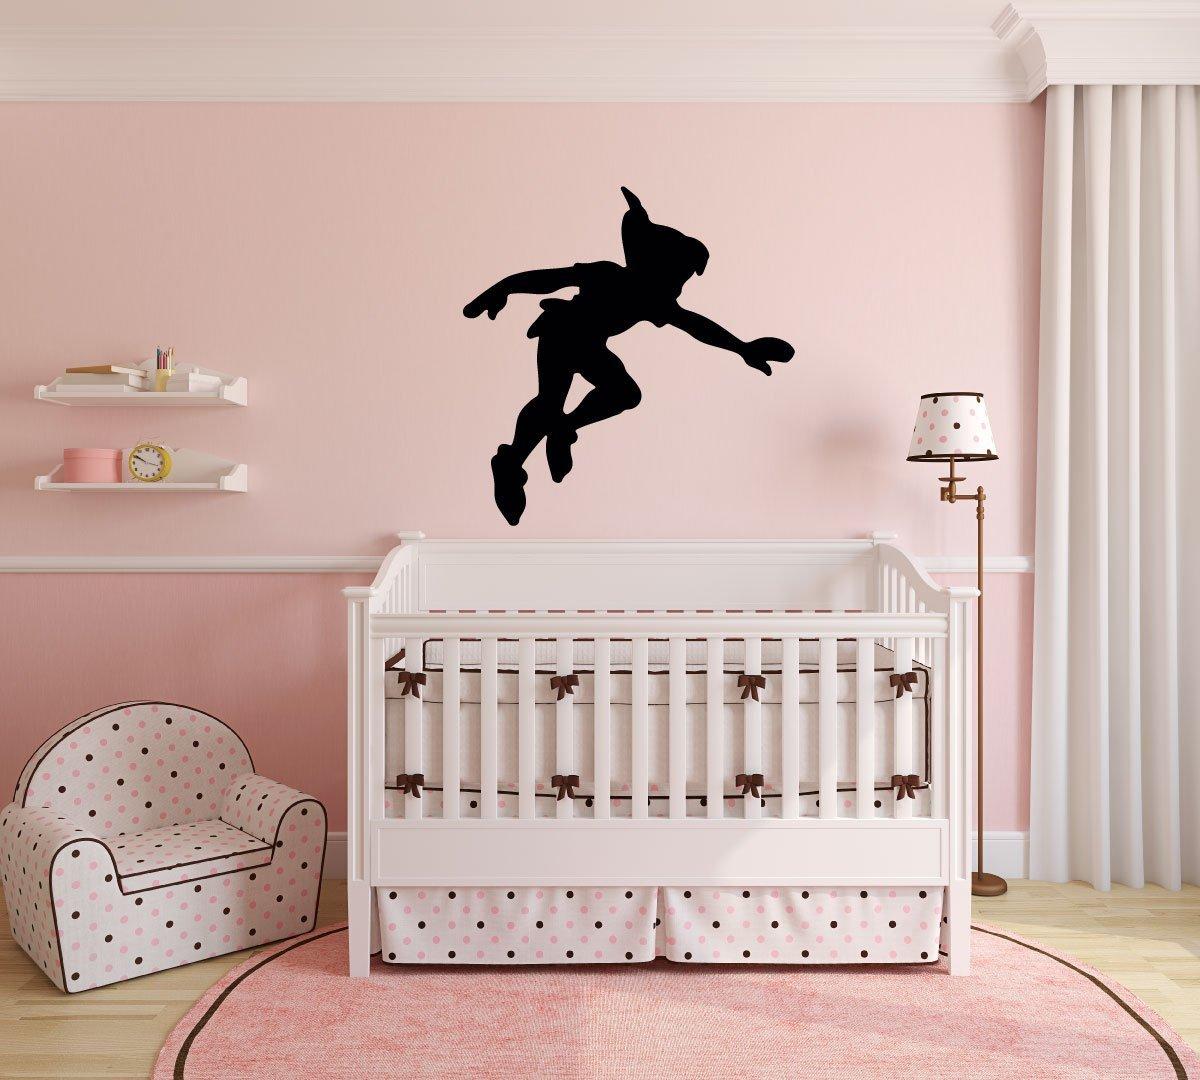 Peter Pan Wall Decal Vinyl Sticker, Disney Shadow Character Art Silhouette for Kids Playroom, Bedroom, Nursery